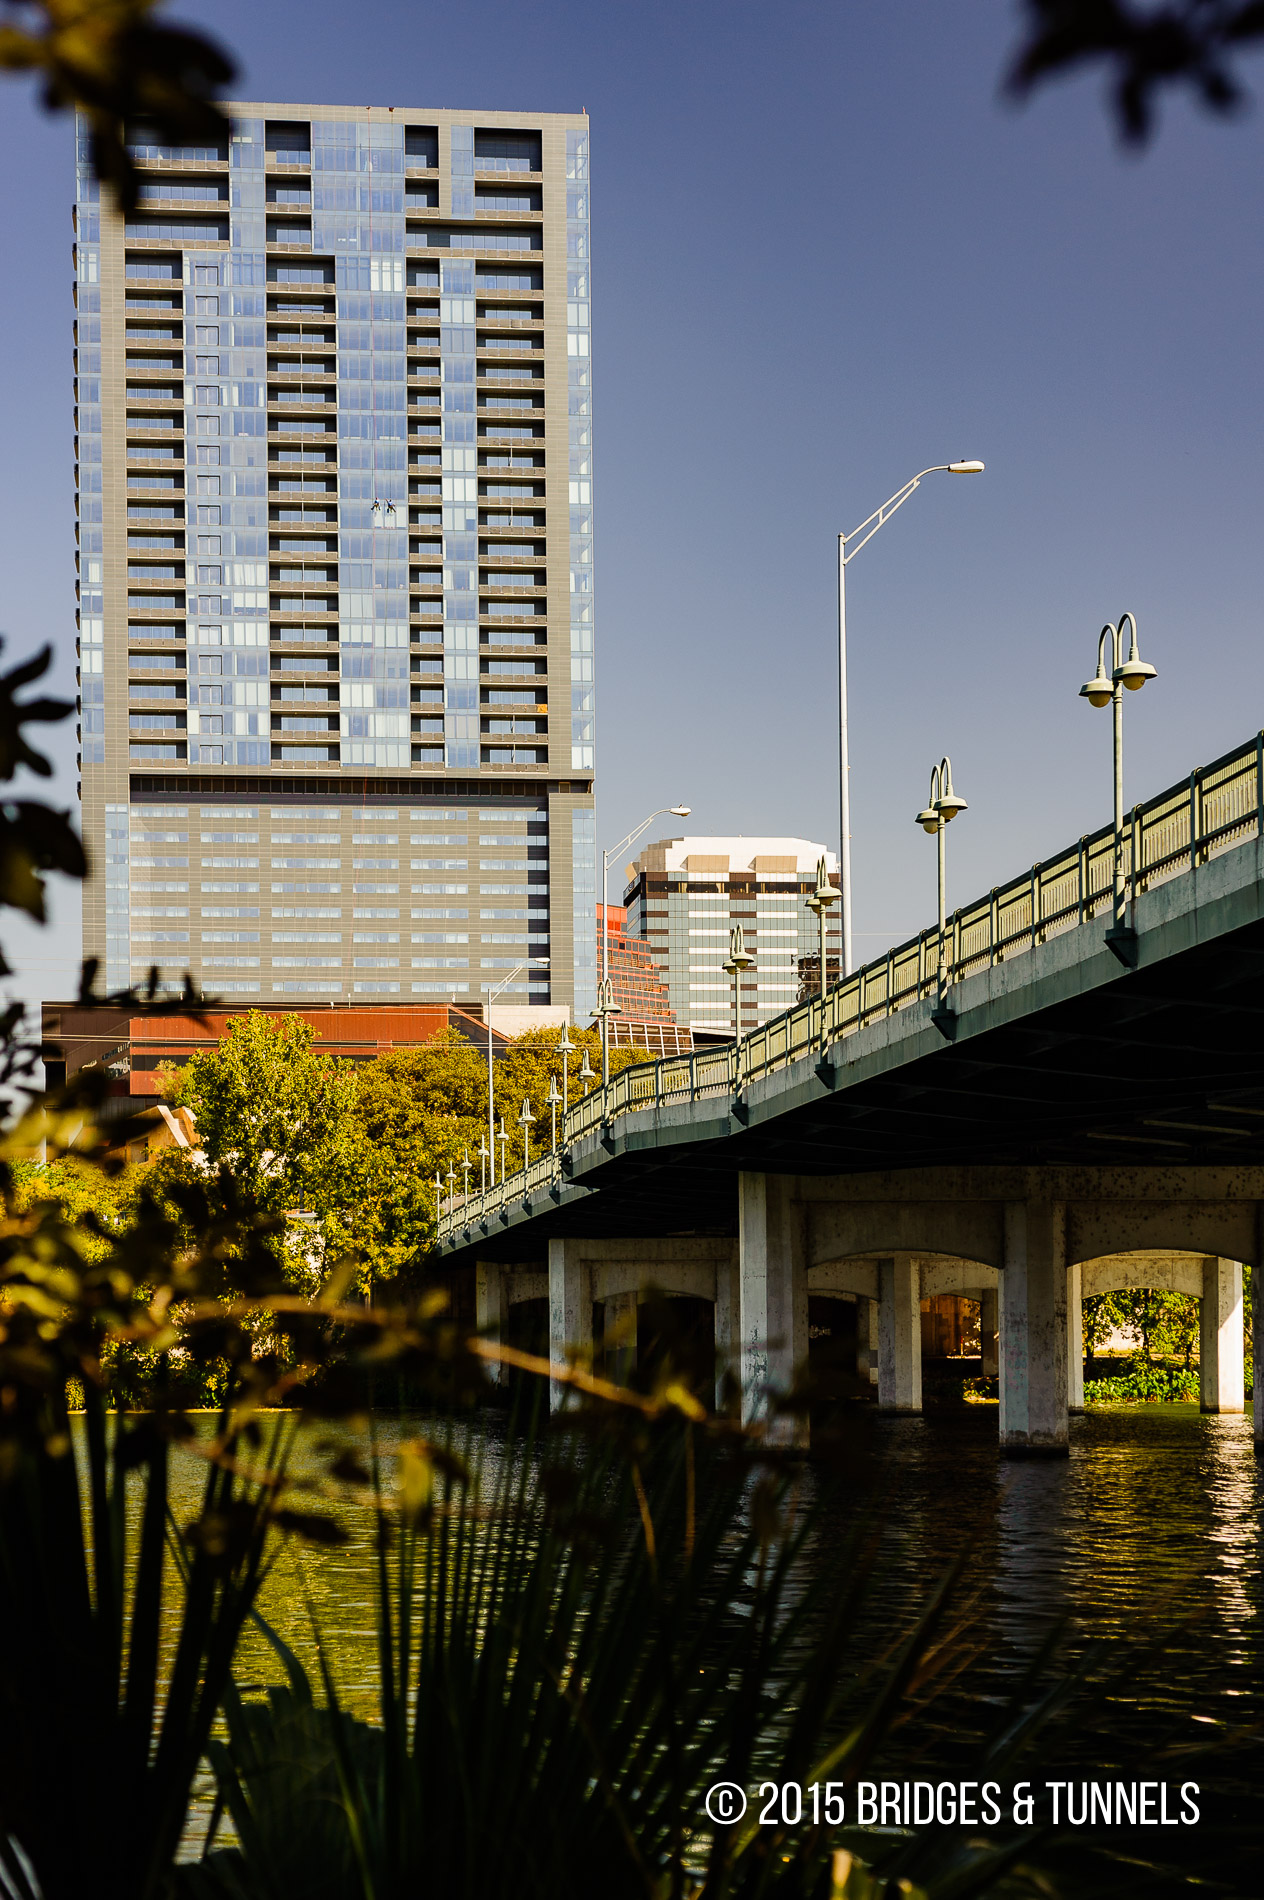 South 1st Street Bridge